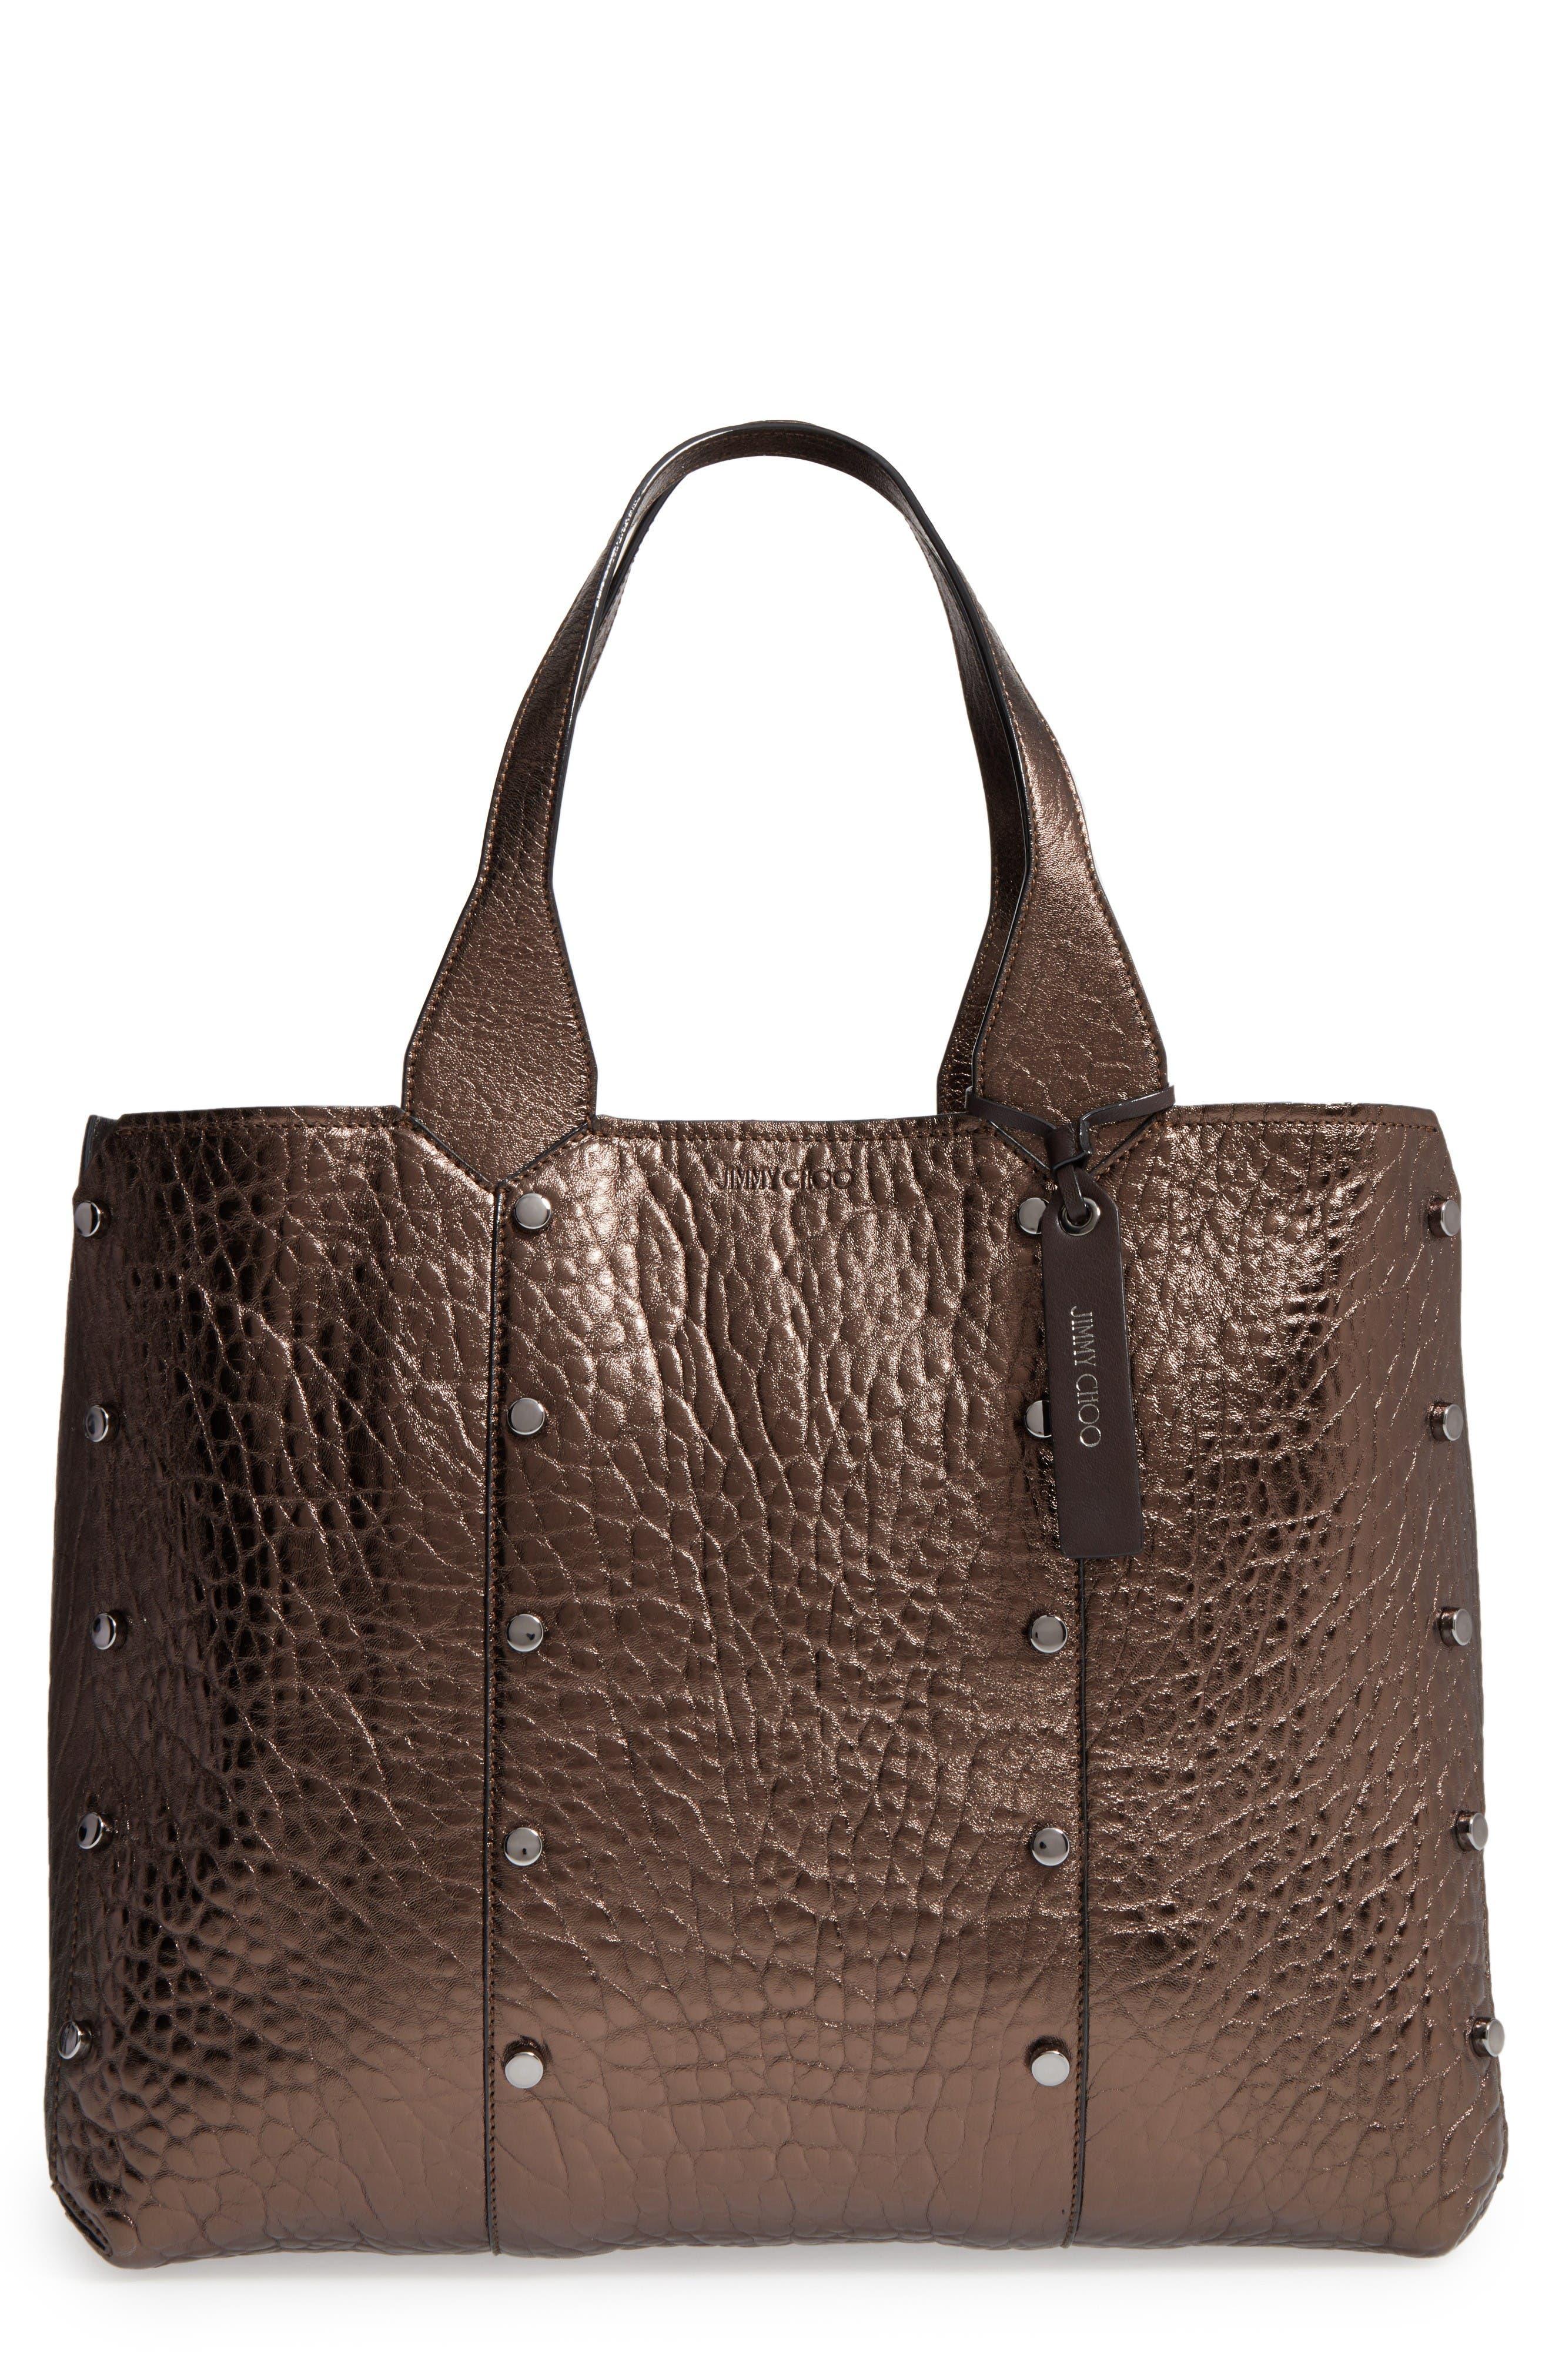 Jimmy Choo Lockett Metallic Leather Shopper